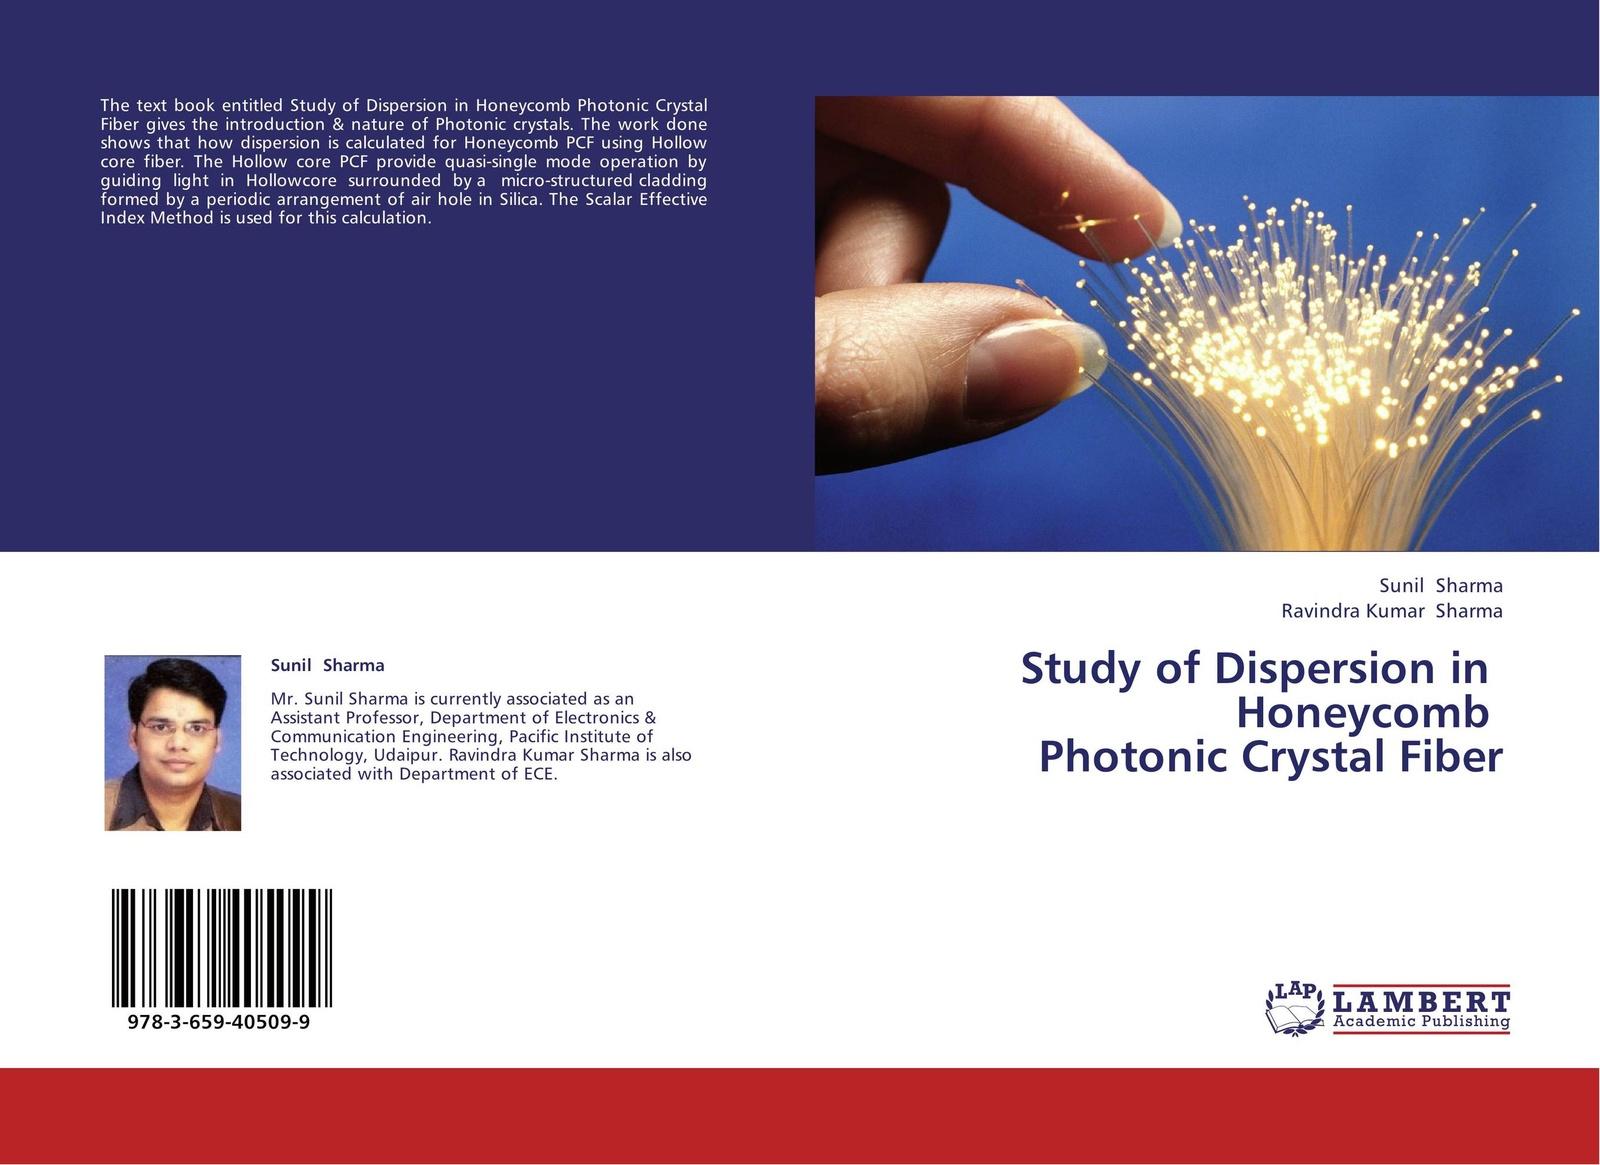 Sunil Sharma and Ravindra Kumar Sharma Study of Dispersion in Honeycomb Photonic Crystal Fiber музыка the crystal method